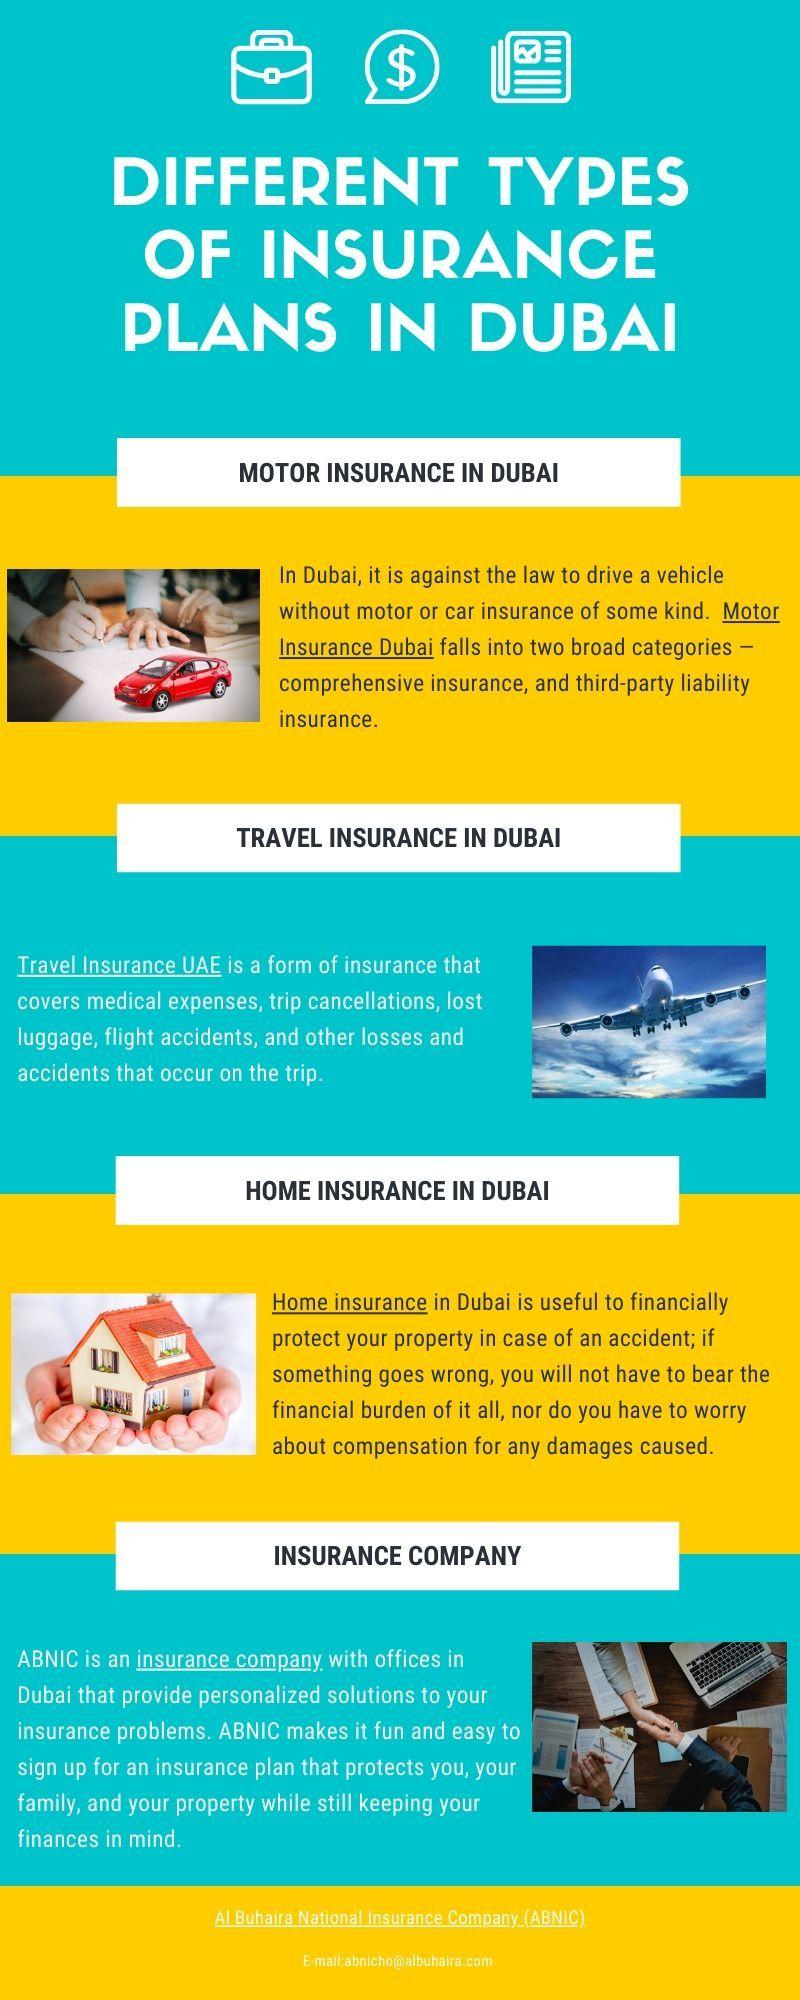 Al Buhaira National Insurance Company (ABNIC) is a Leading